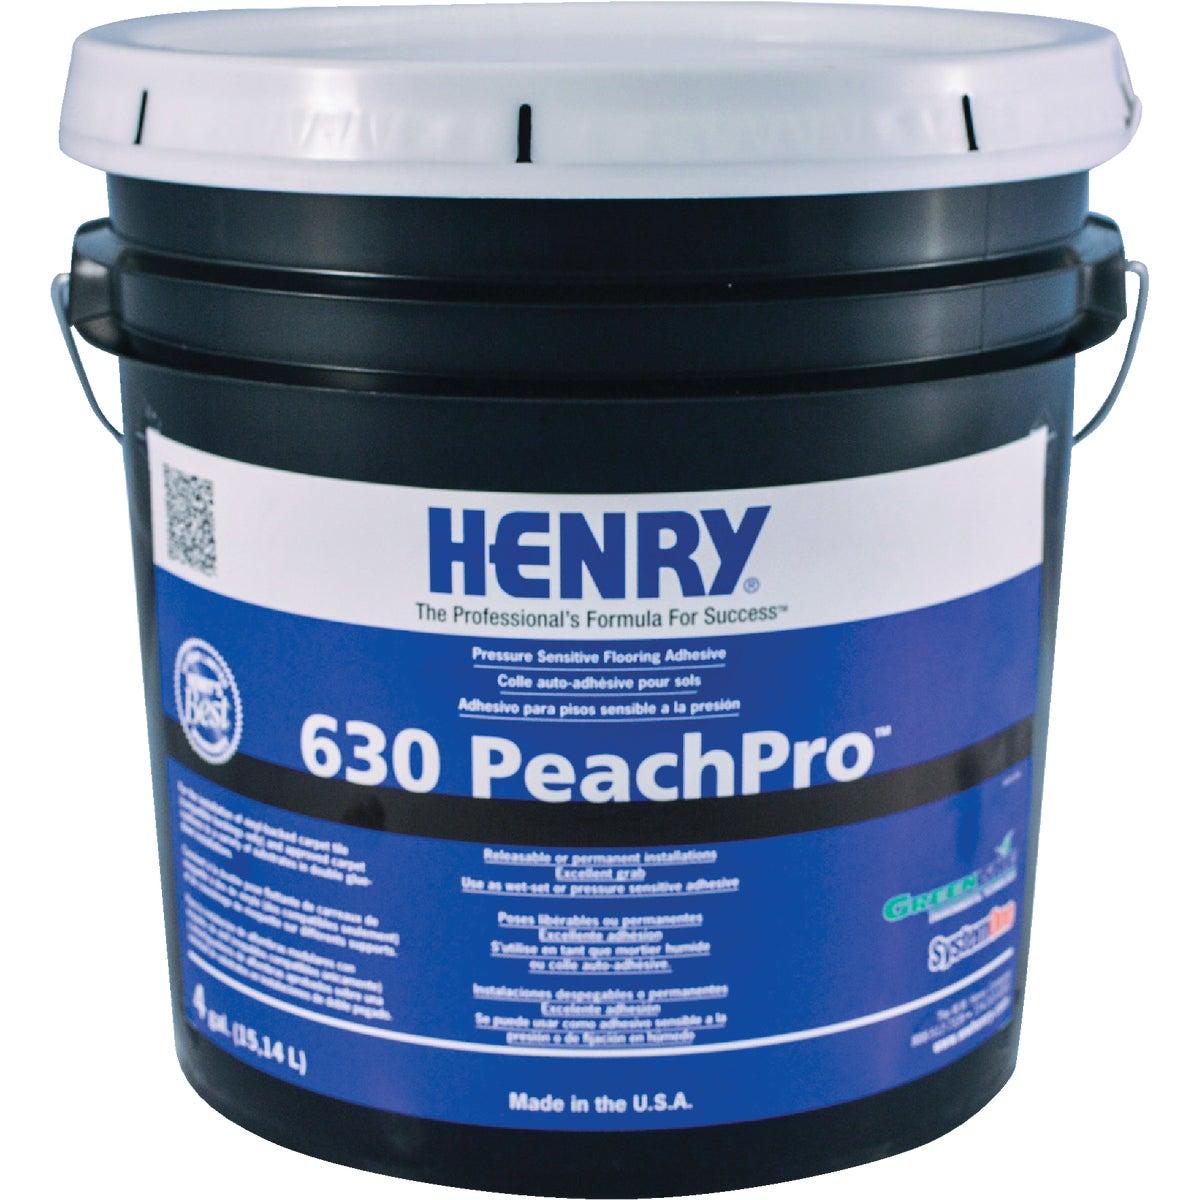 4G 630 PEACH PR ADHESIVE - 12175 by Henry W W Company